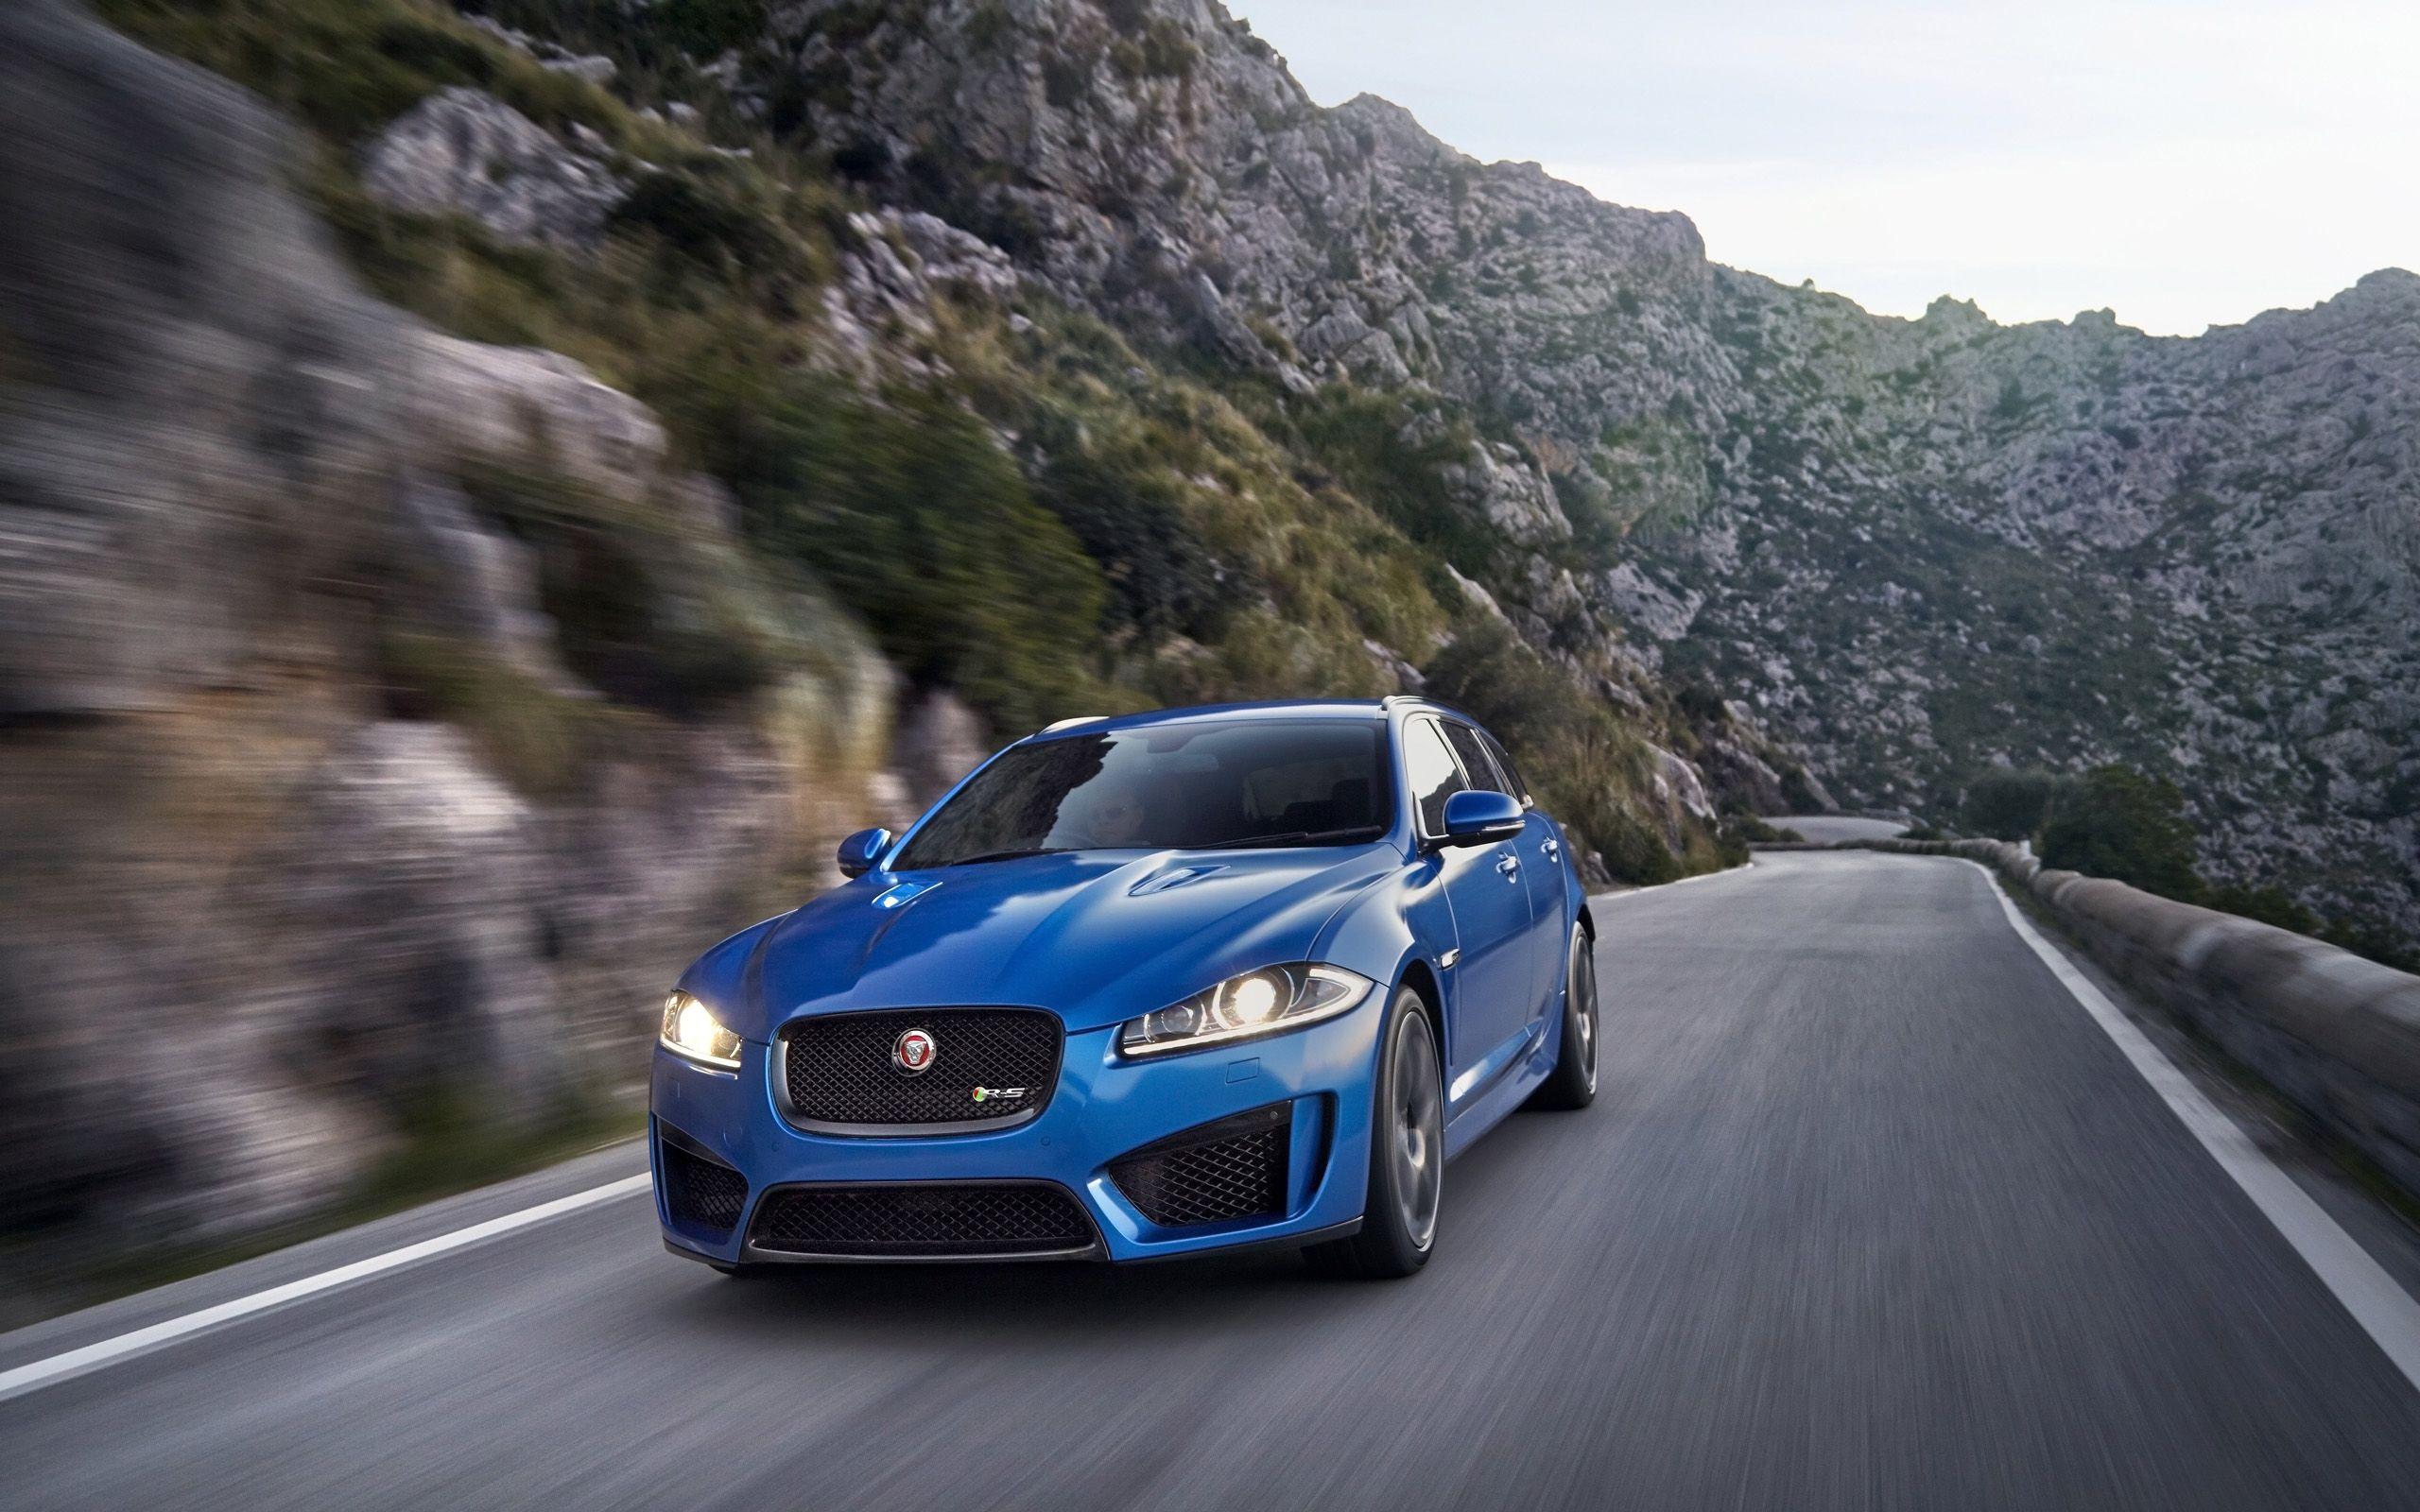 jaguar polaris driving test interior type r coupe f reviews road review jag image coup video car